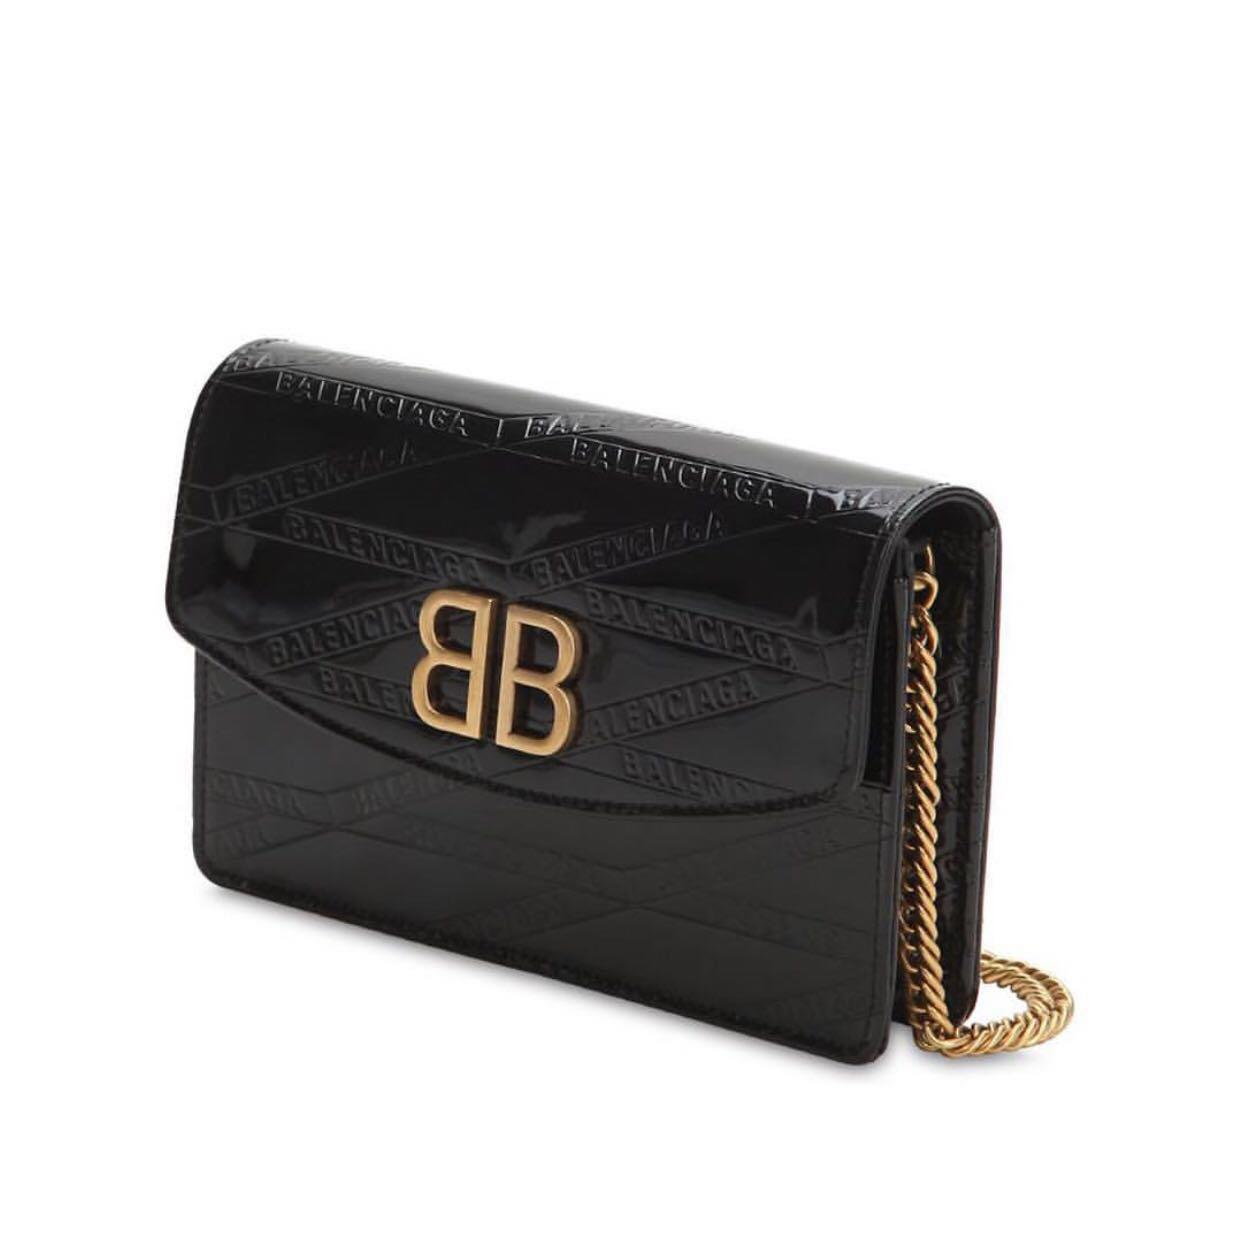 NEW In Box BALENCIAGA BB All Over Logo Printed Shoulder Bag in Black GHW